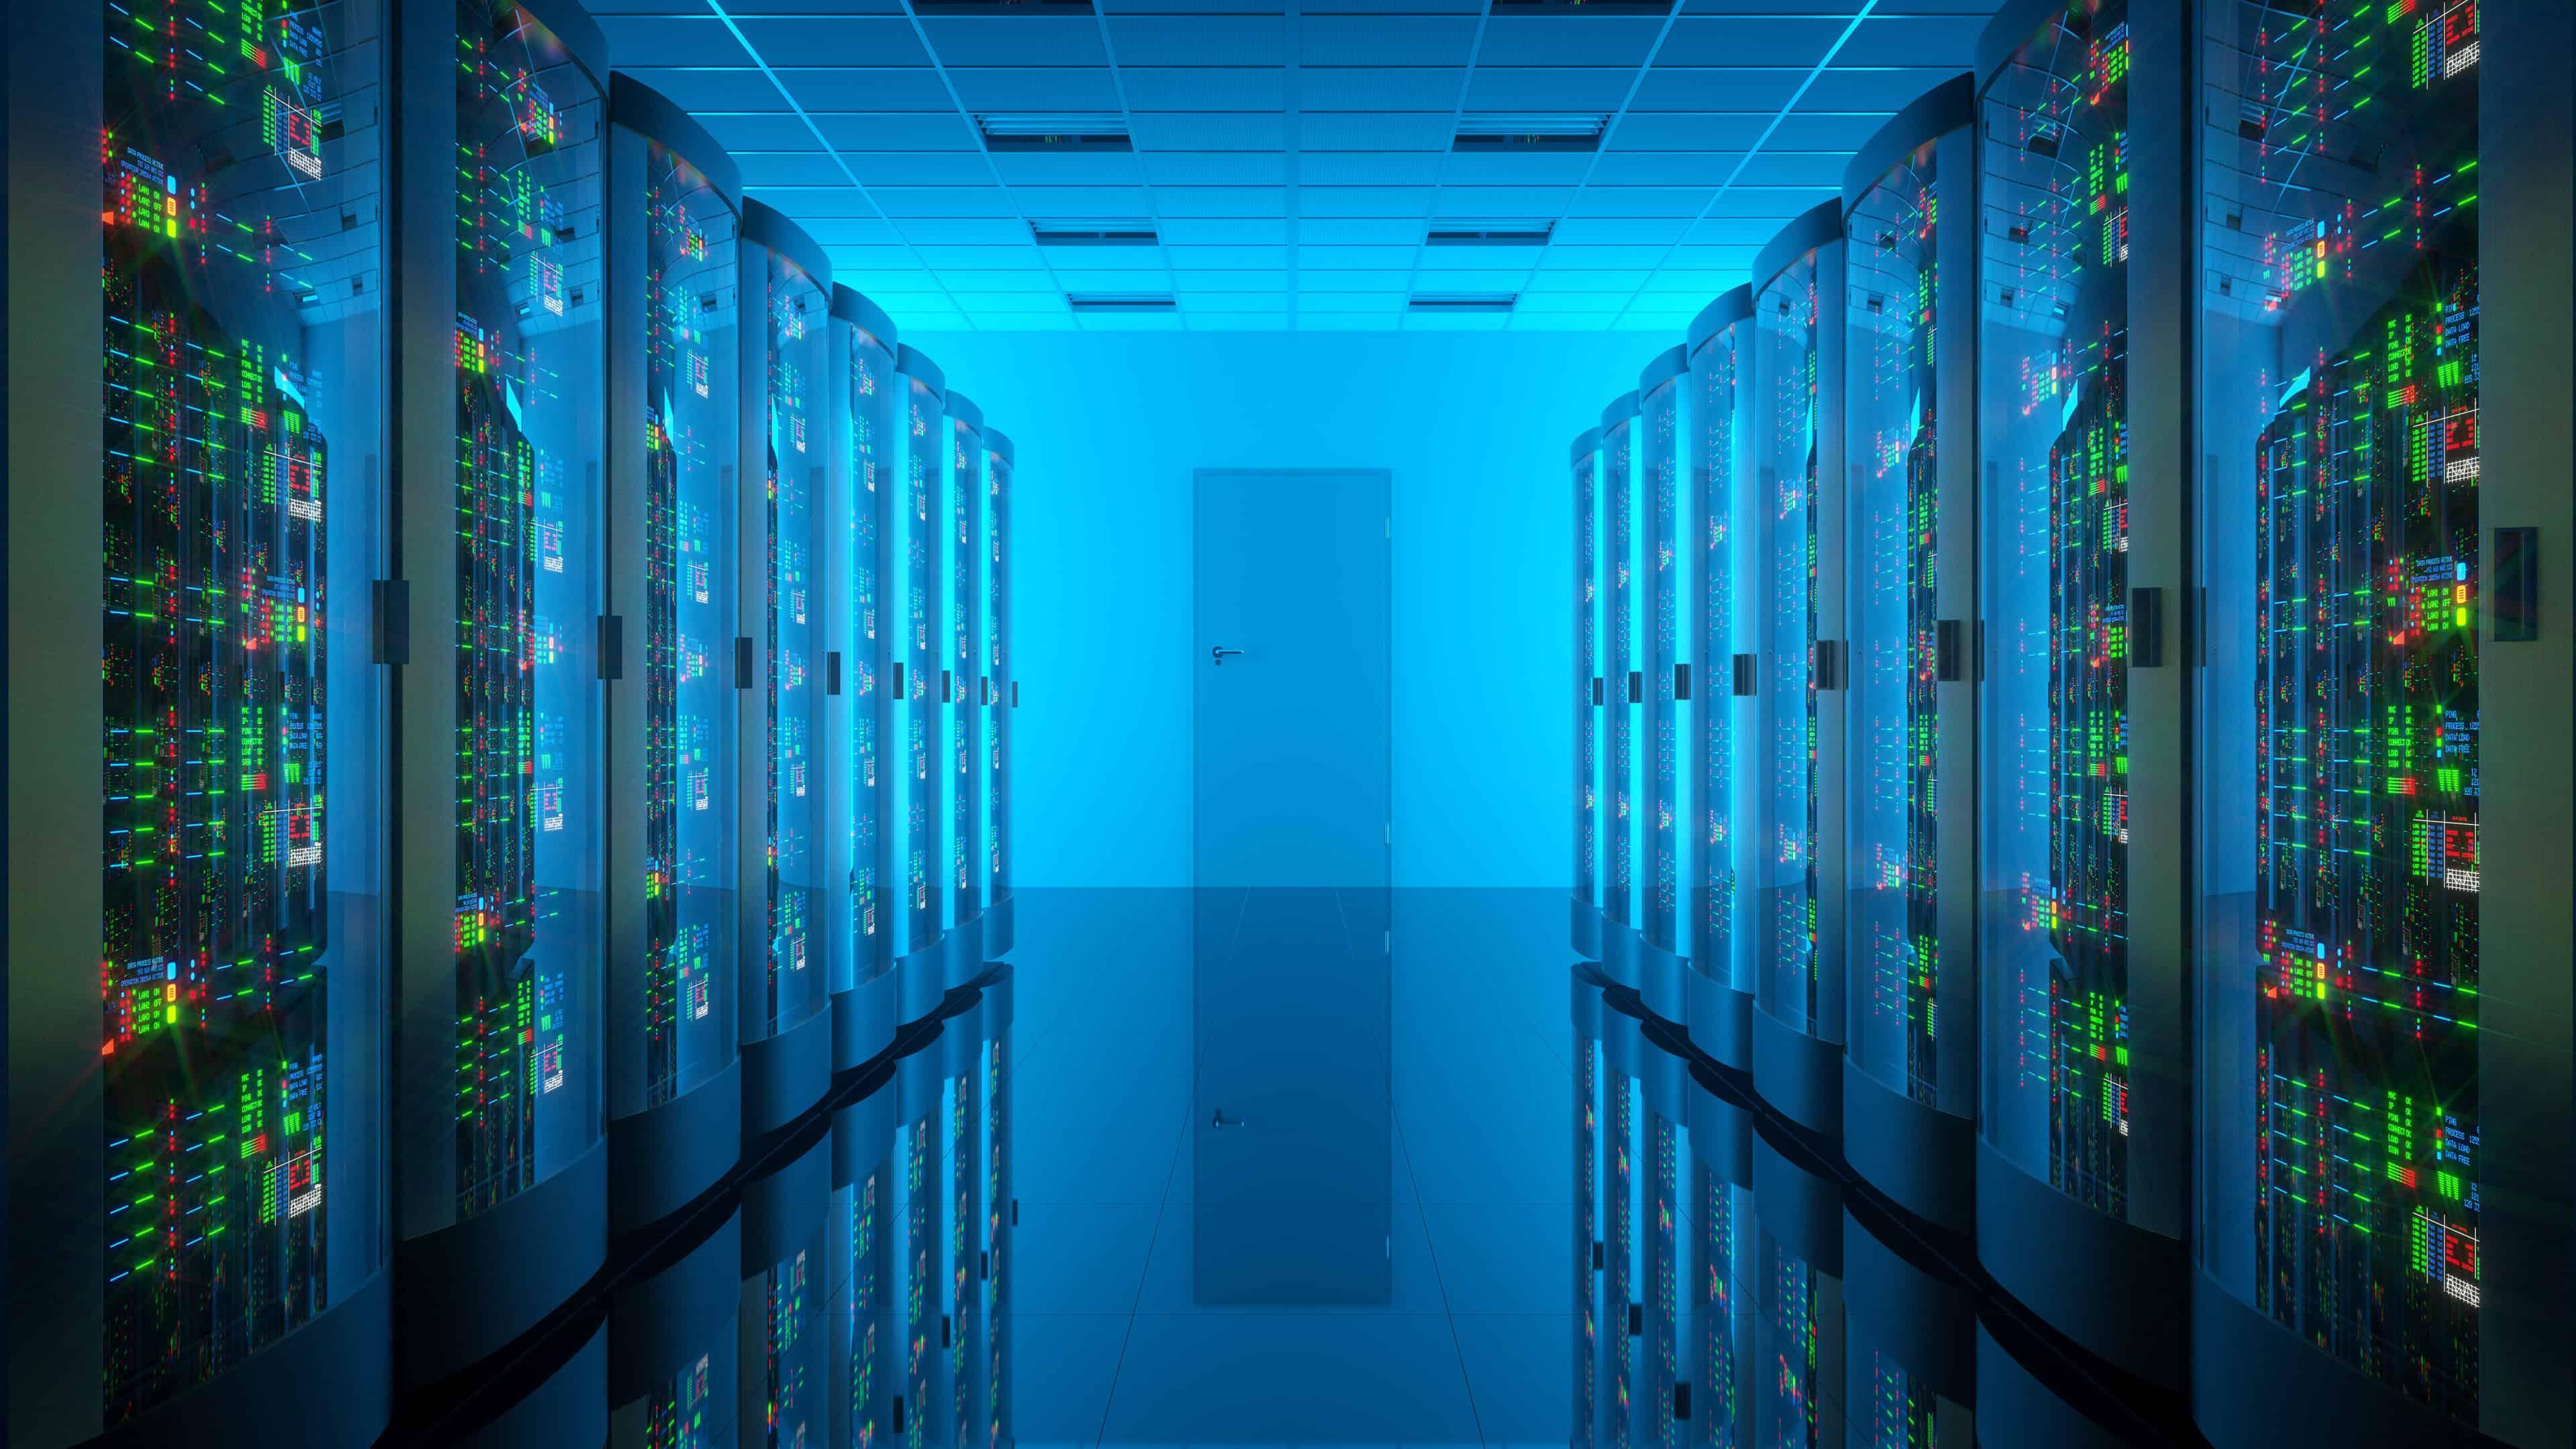 server room blue uhd 4k wallpaper